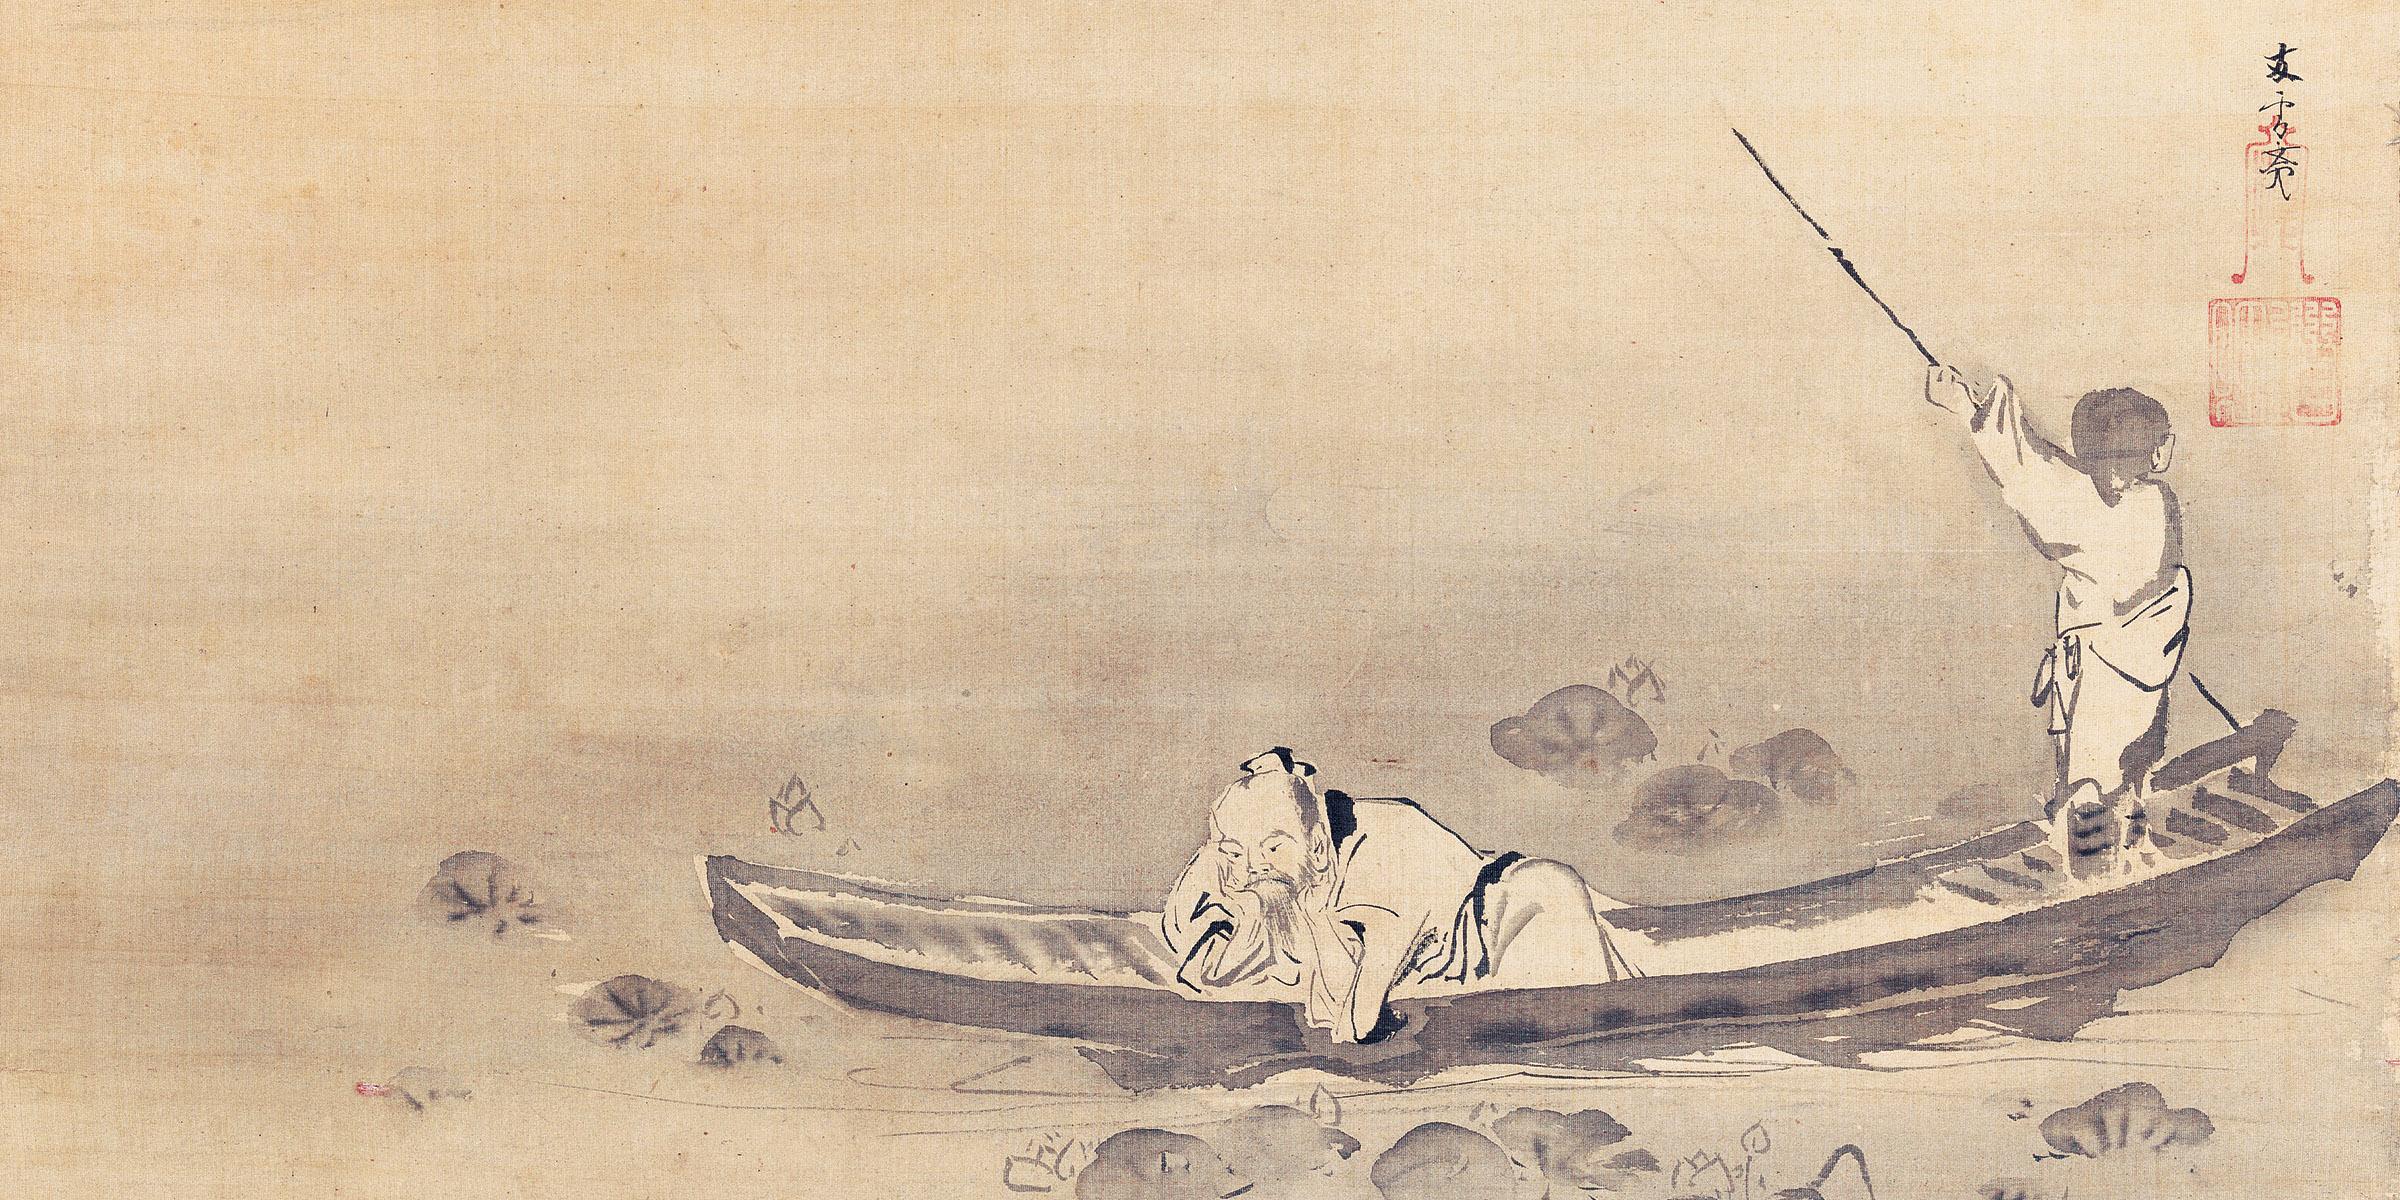 Zhou Maoshu Admiring Lotuses, by Yusetsu, mid-seventeenth century.